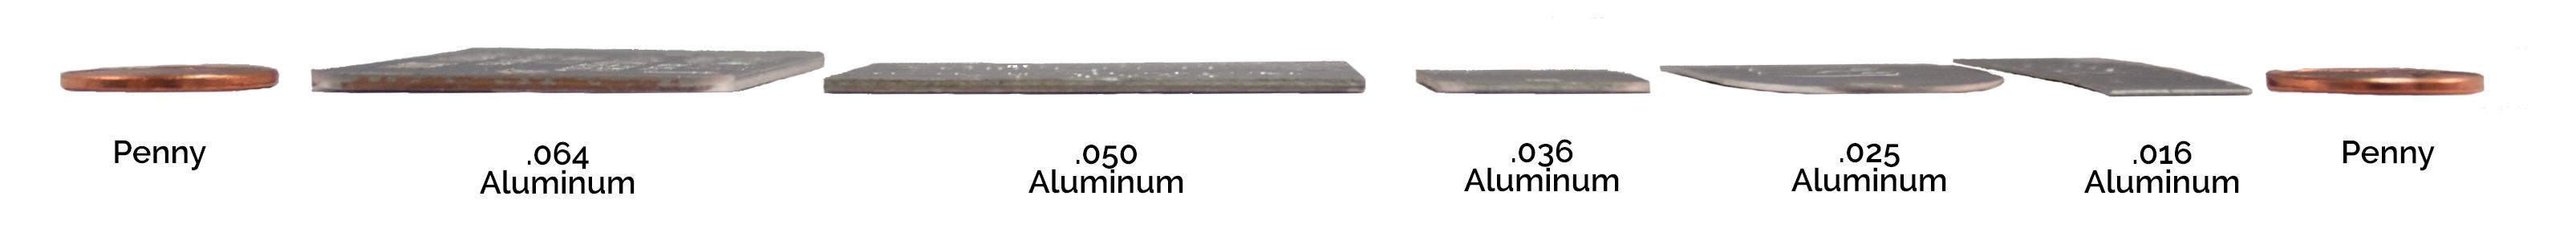 aluminum tag thickness